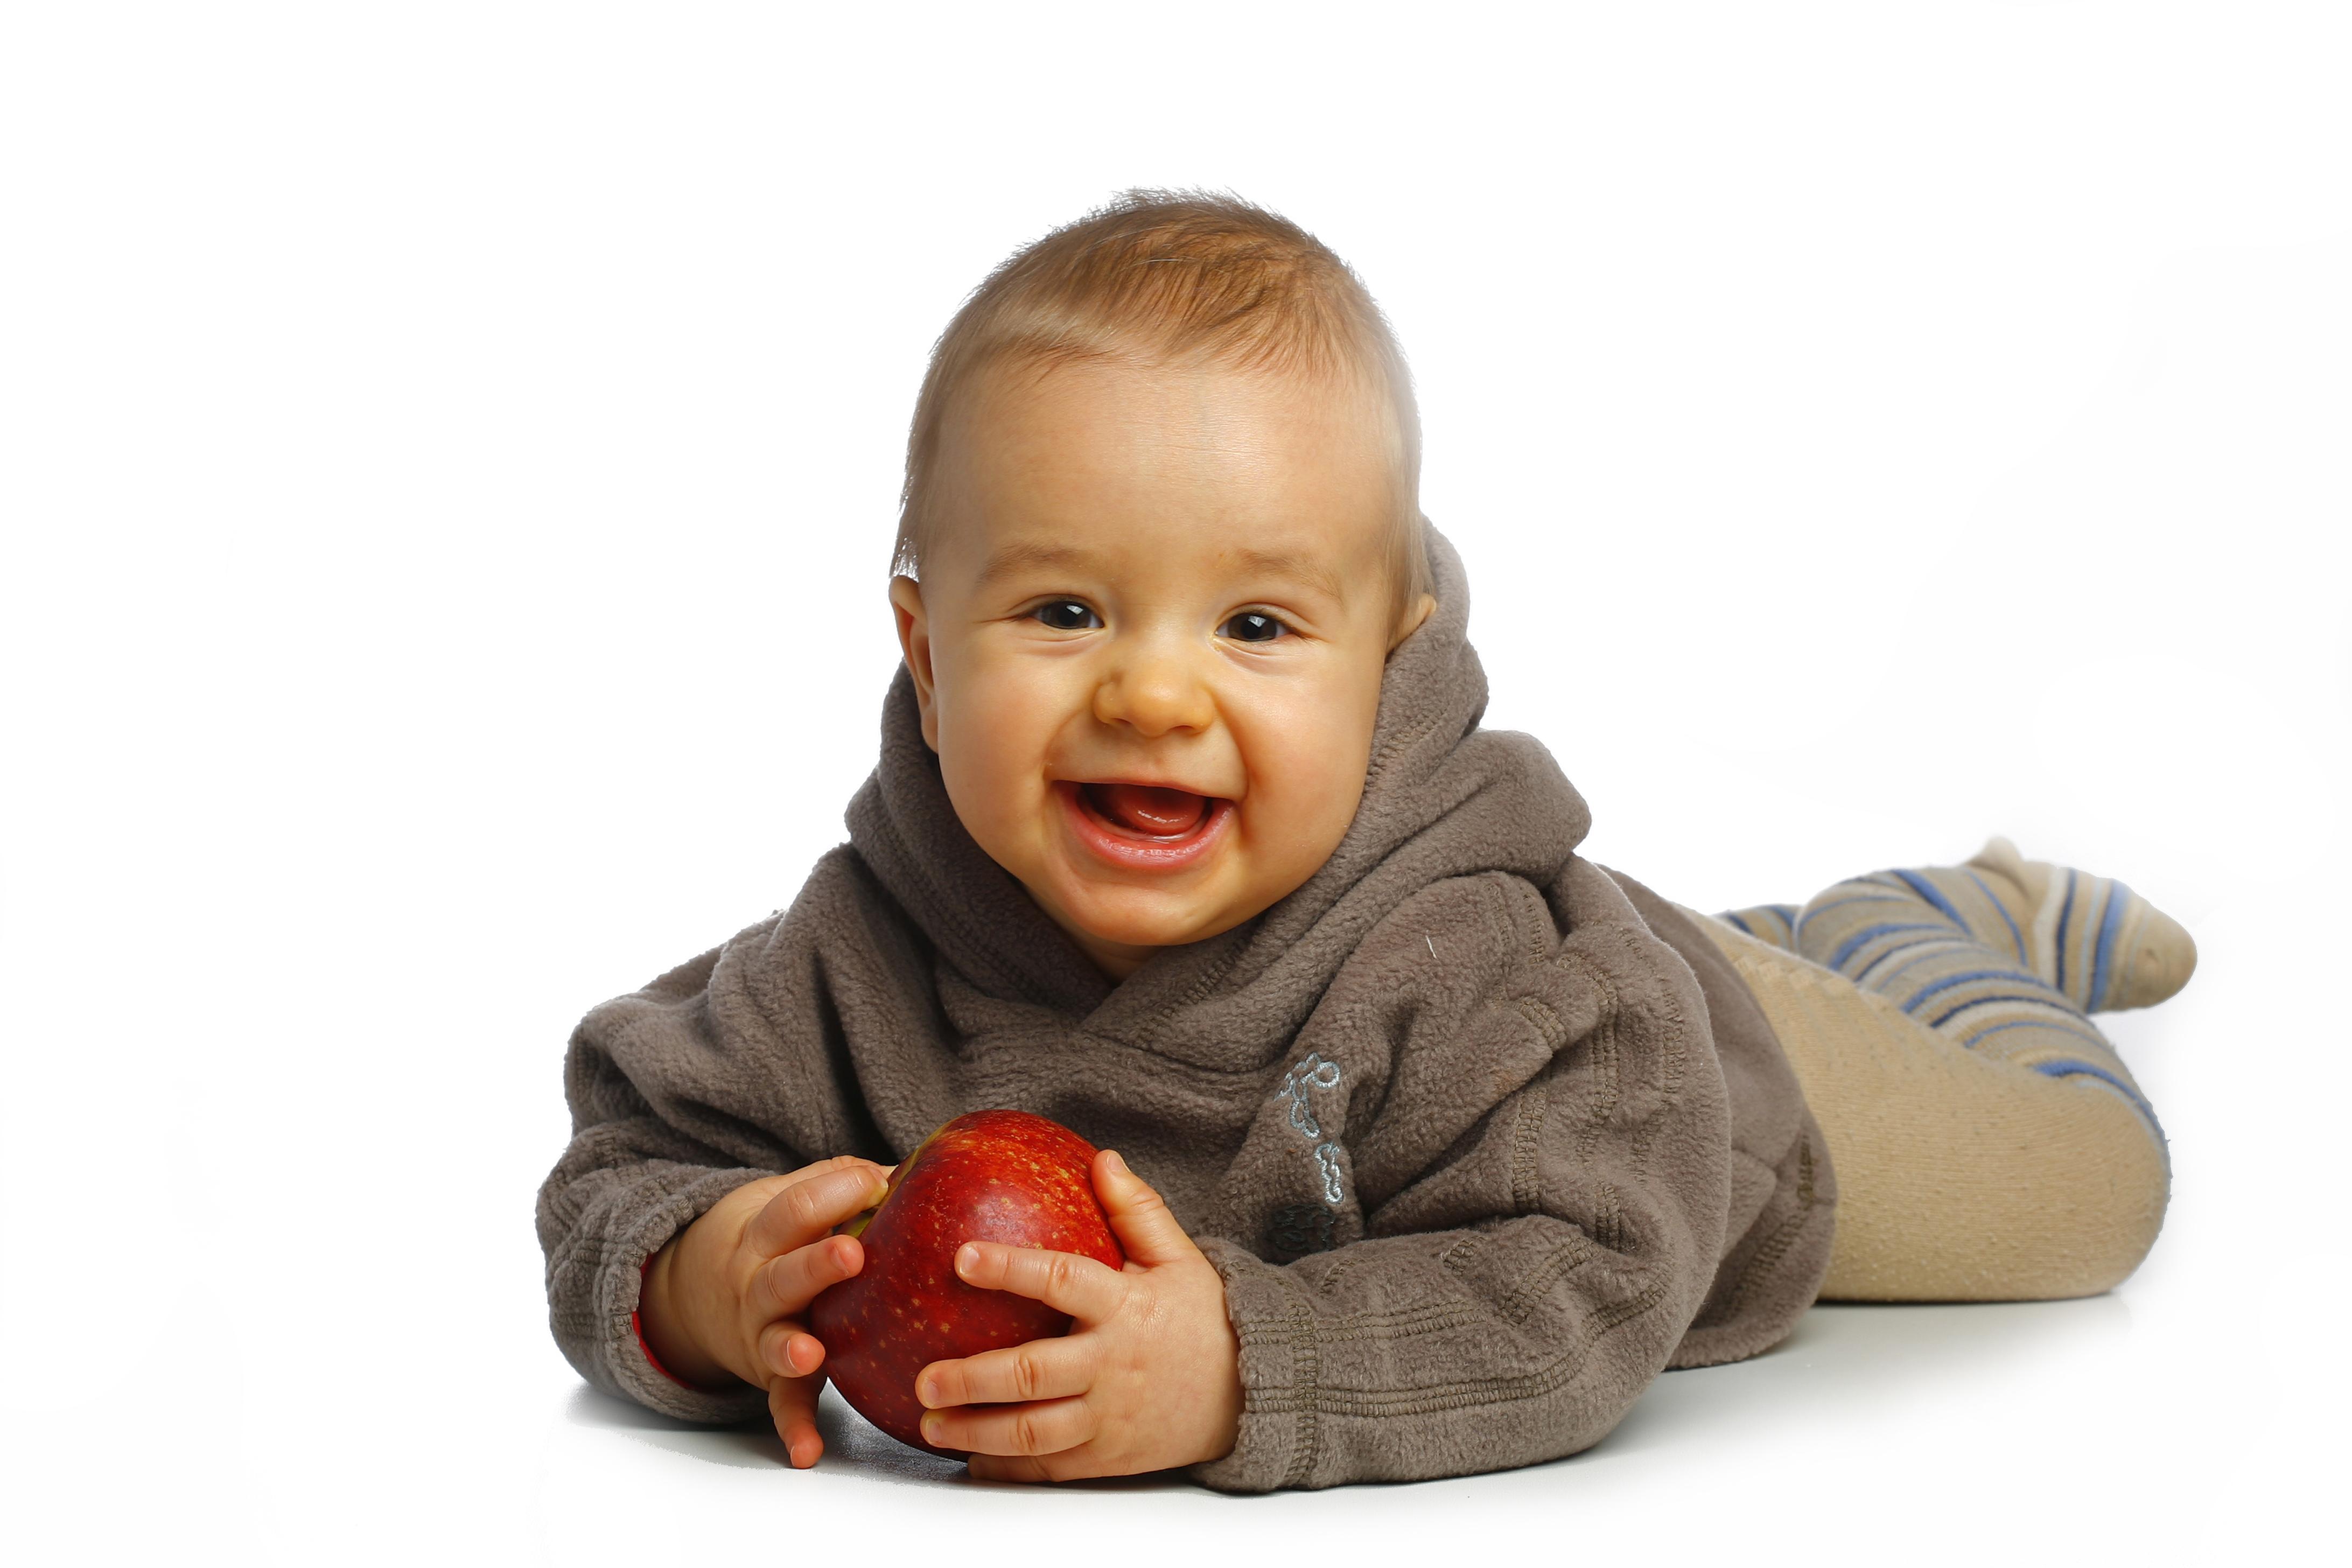 Desktop Wallpapers Baby Smile Children Apples Infants newborn child